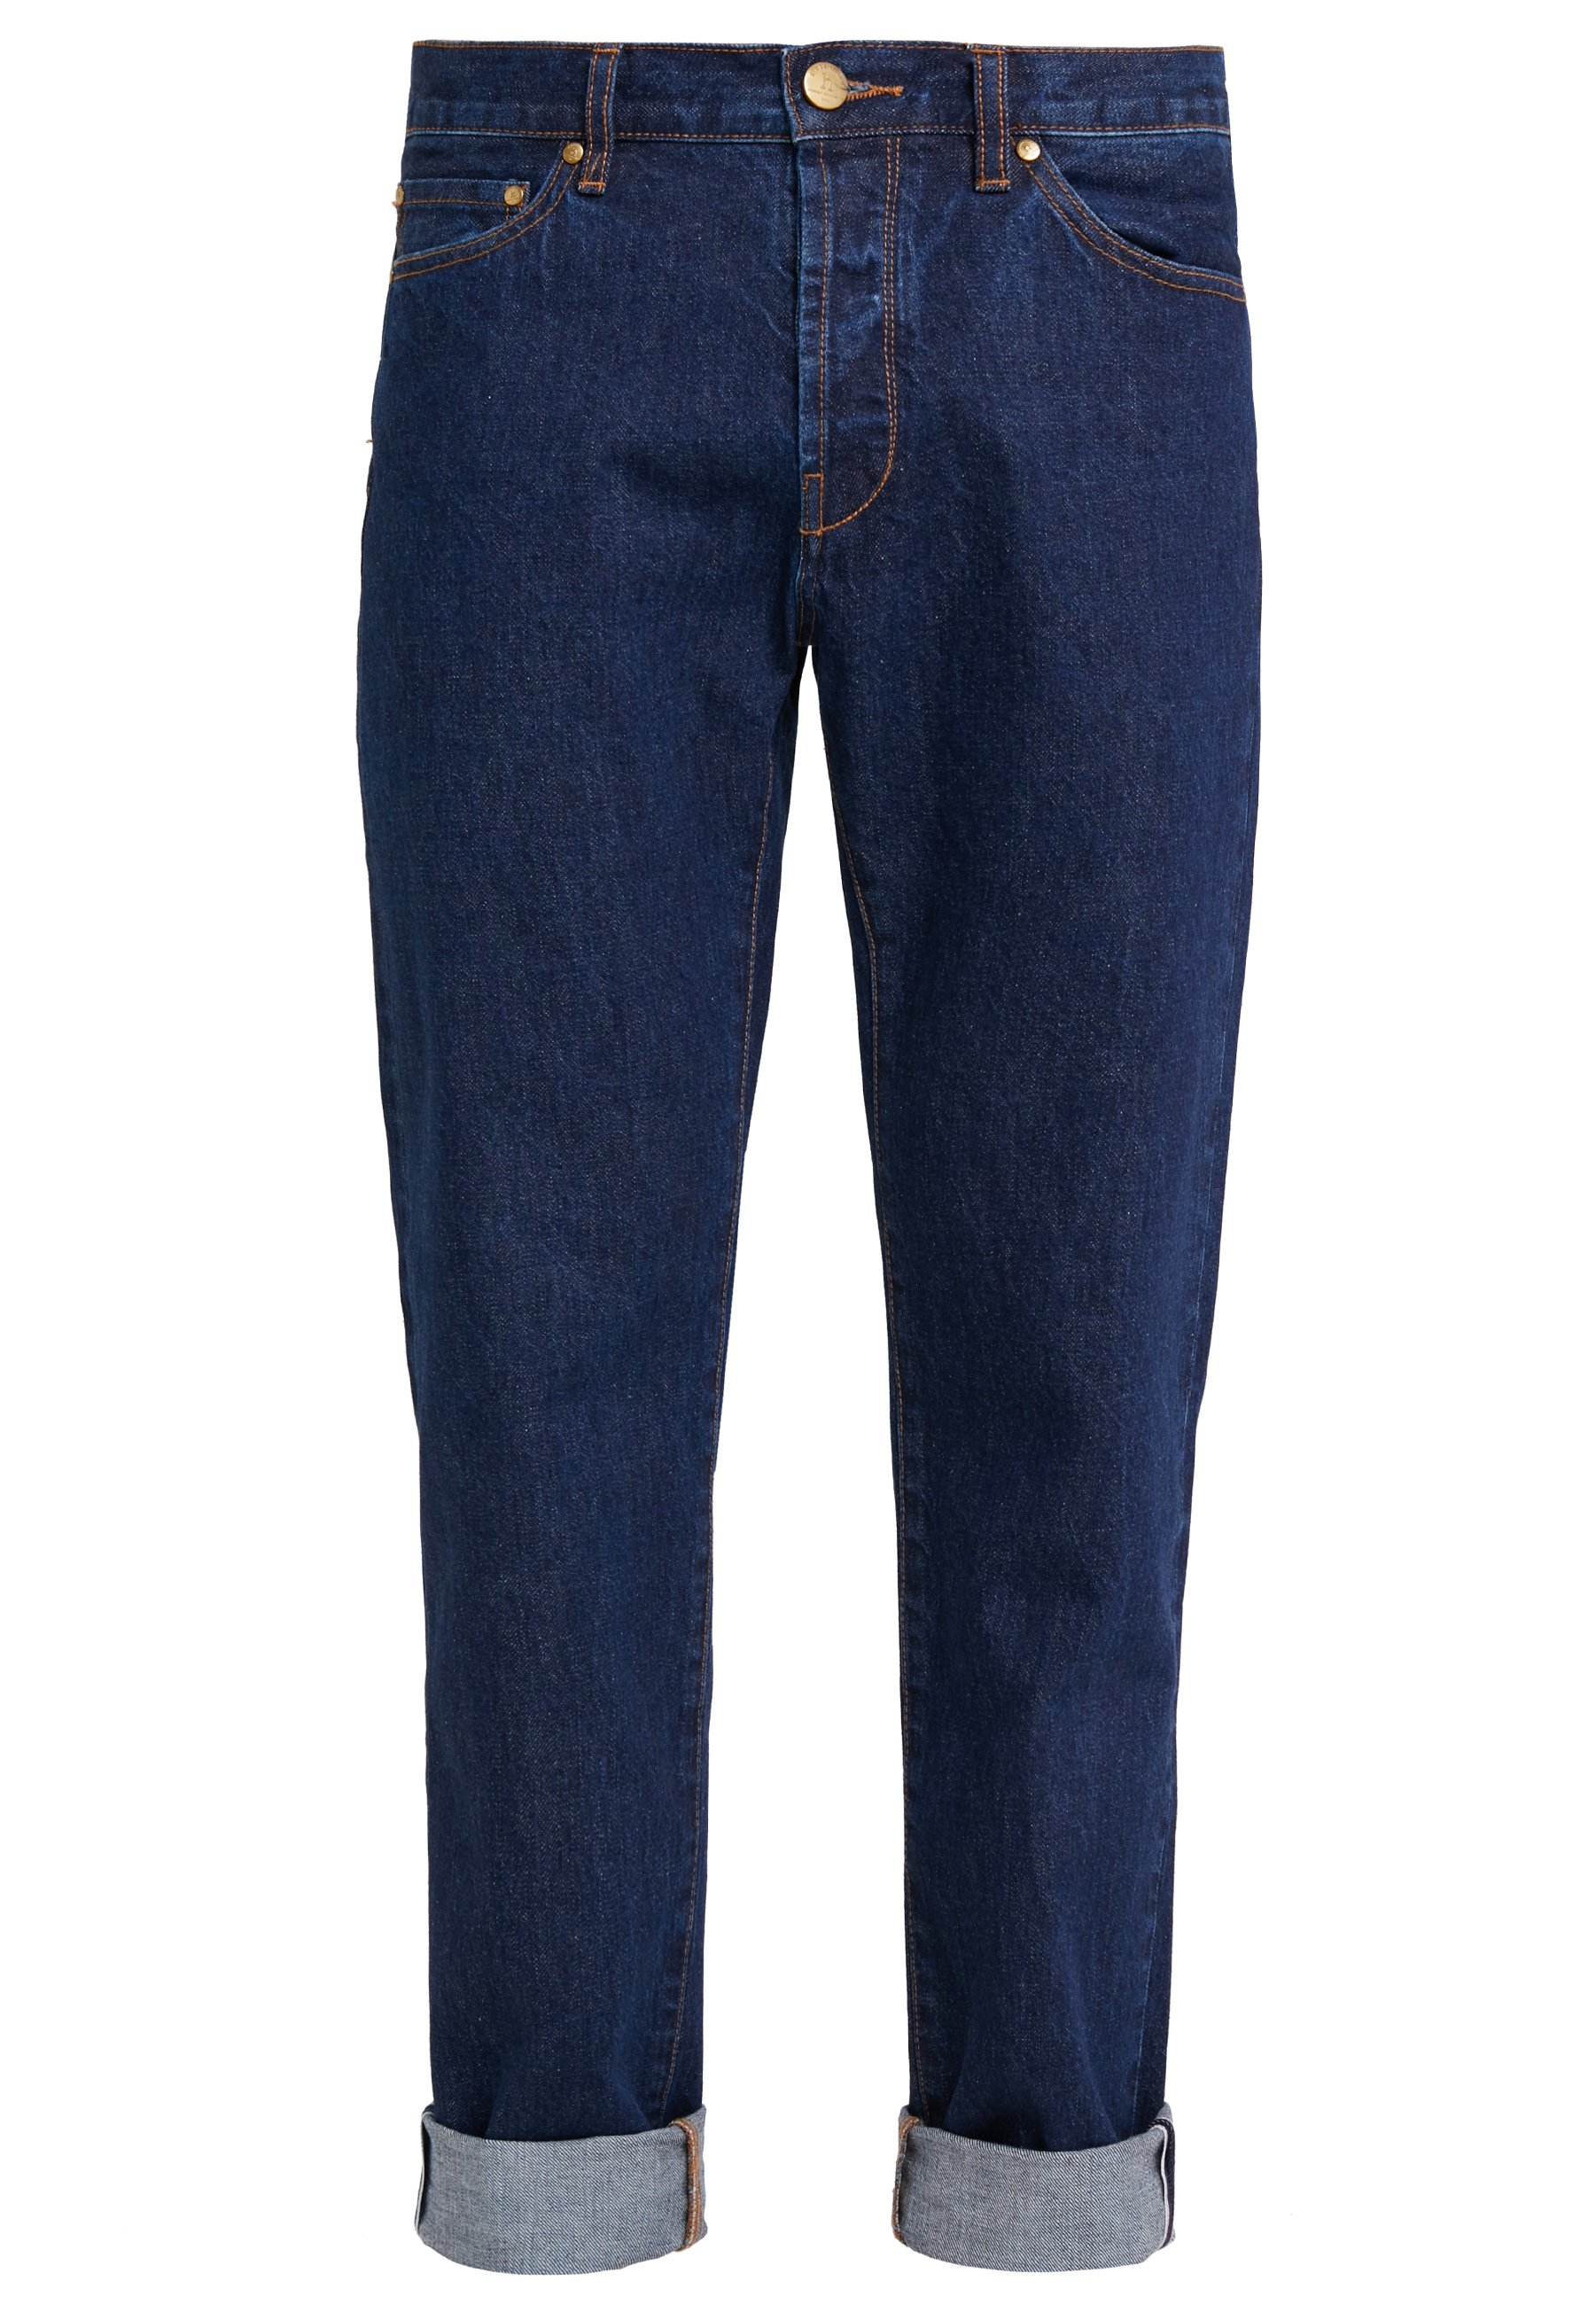 Han Kjobenhavn Jeans Tapered Fit - Medium Blue